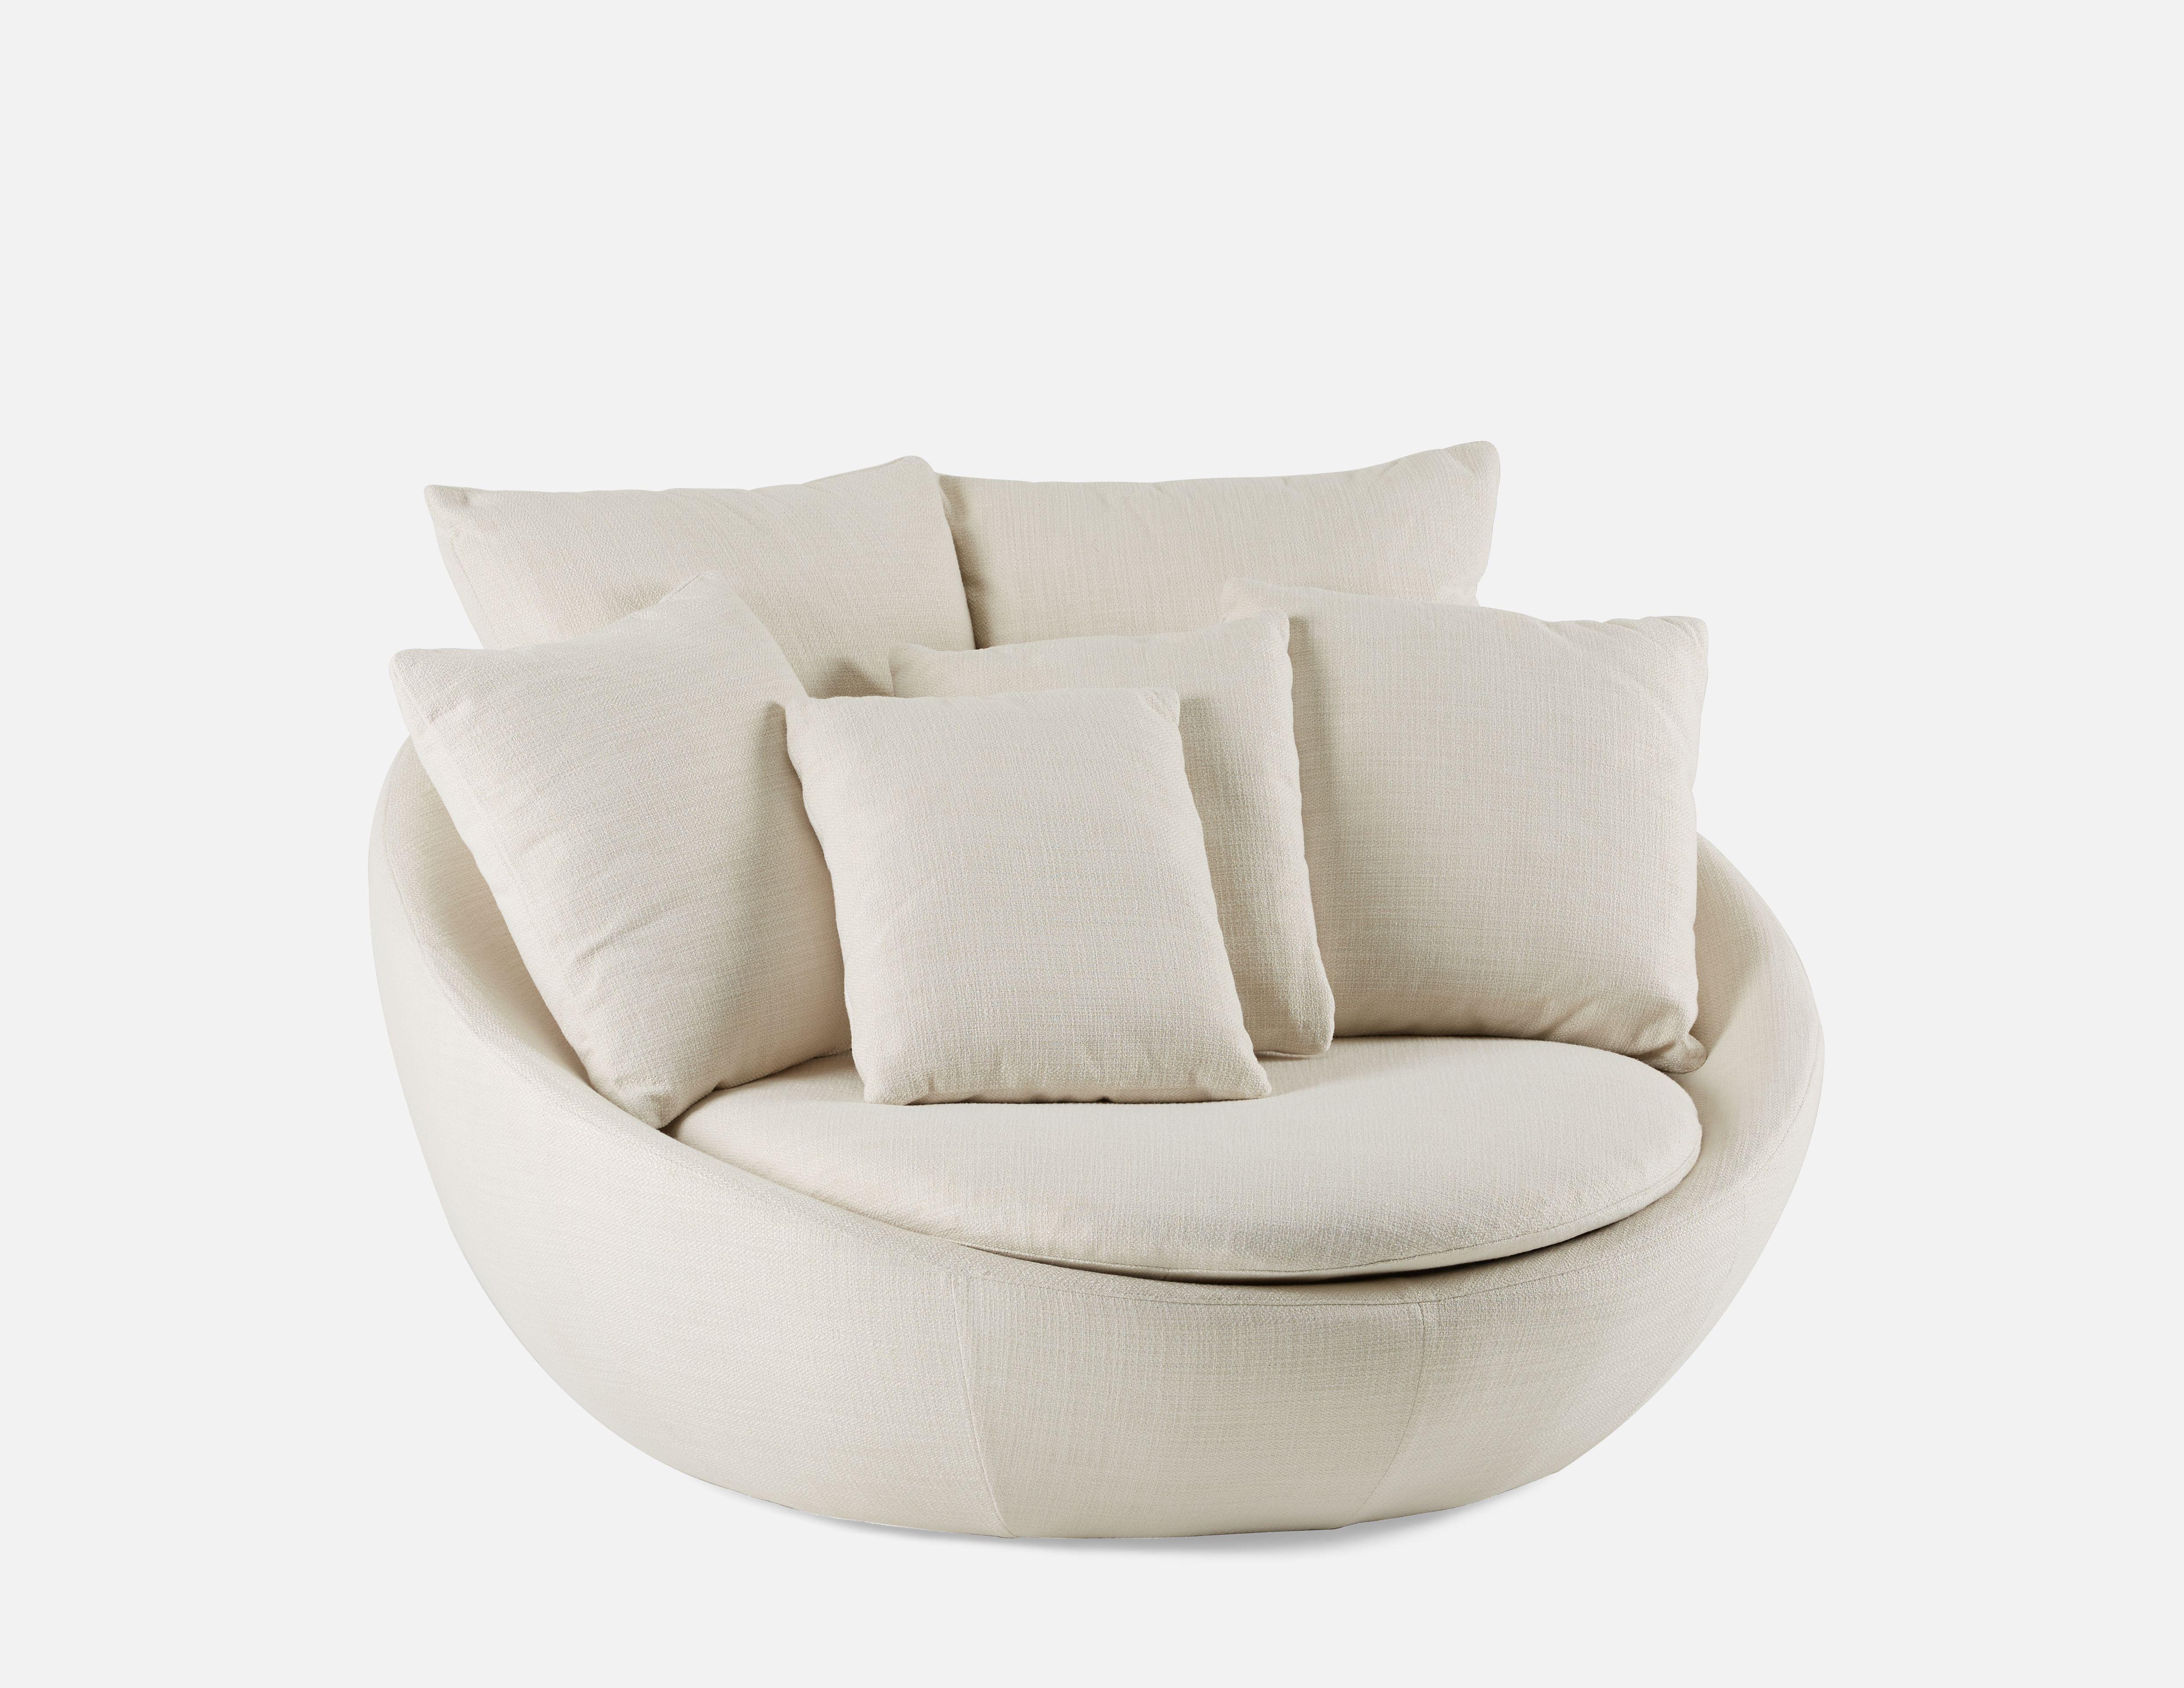 Sensational Cozy Cream Round Shaped Loveseat In 2019 Cuddle Chair Machost Co Dining Chair Design Ideas Machostcouk